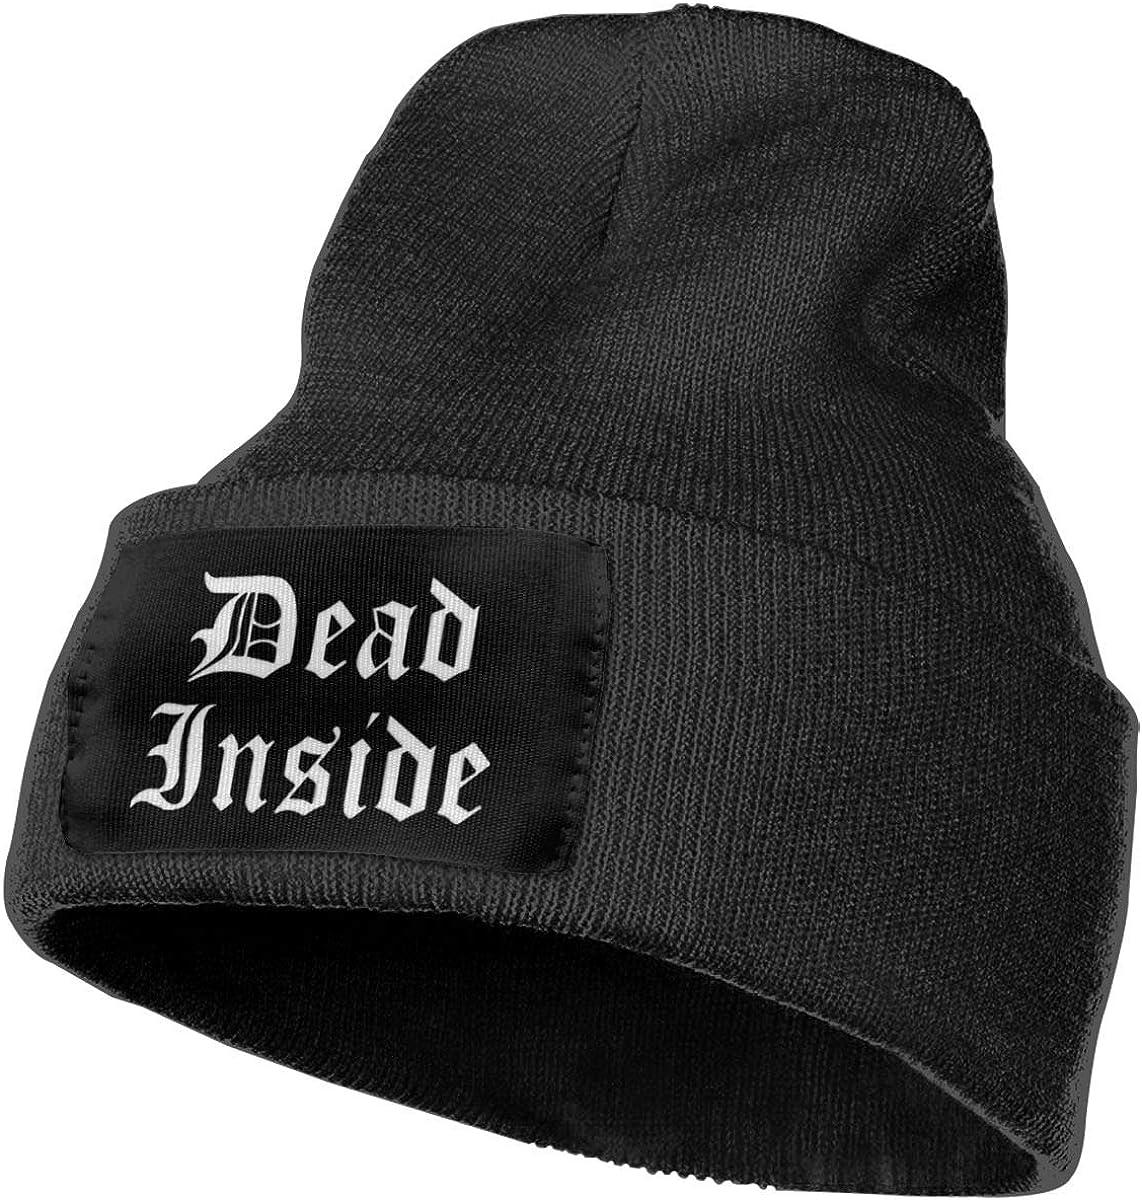 Morbid Embroidery Cuffed Beanie Hat Mental Health Dead Inside